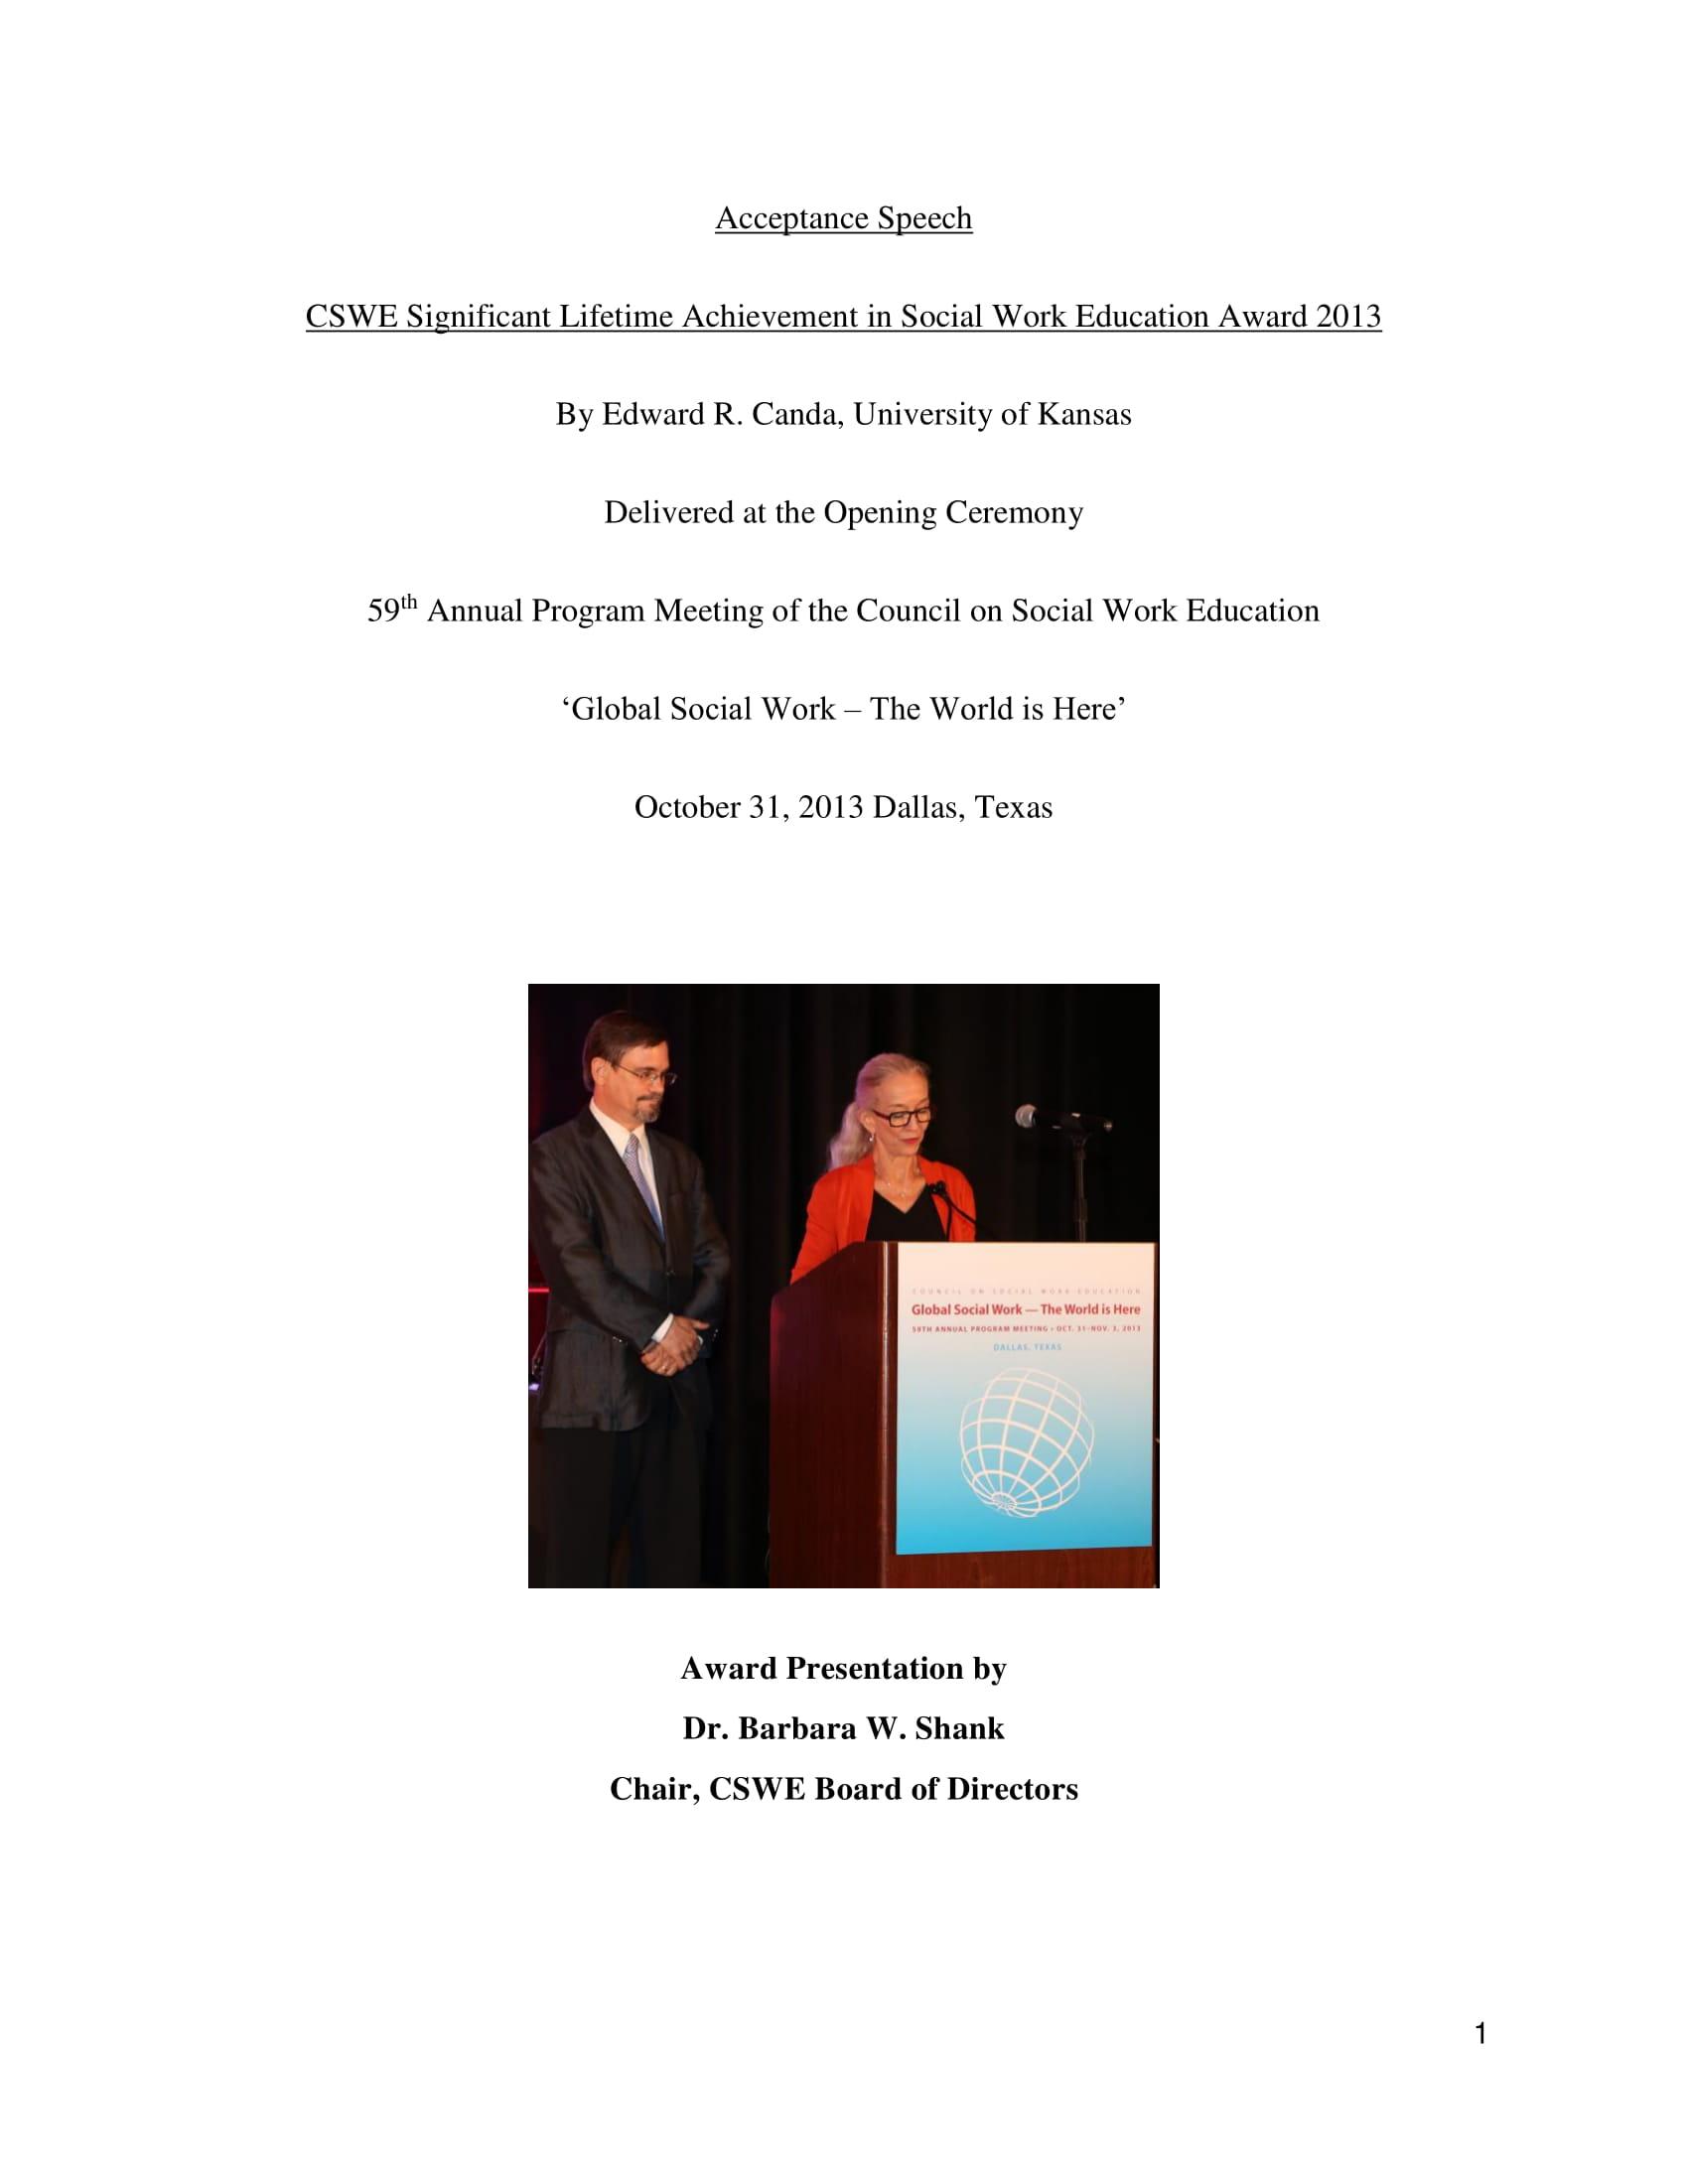 social work education award acceptance speech example